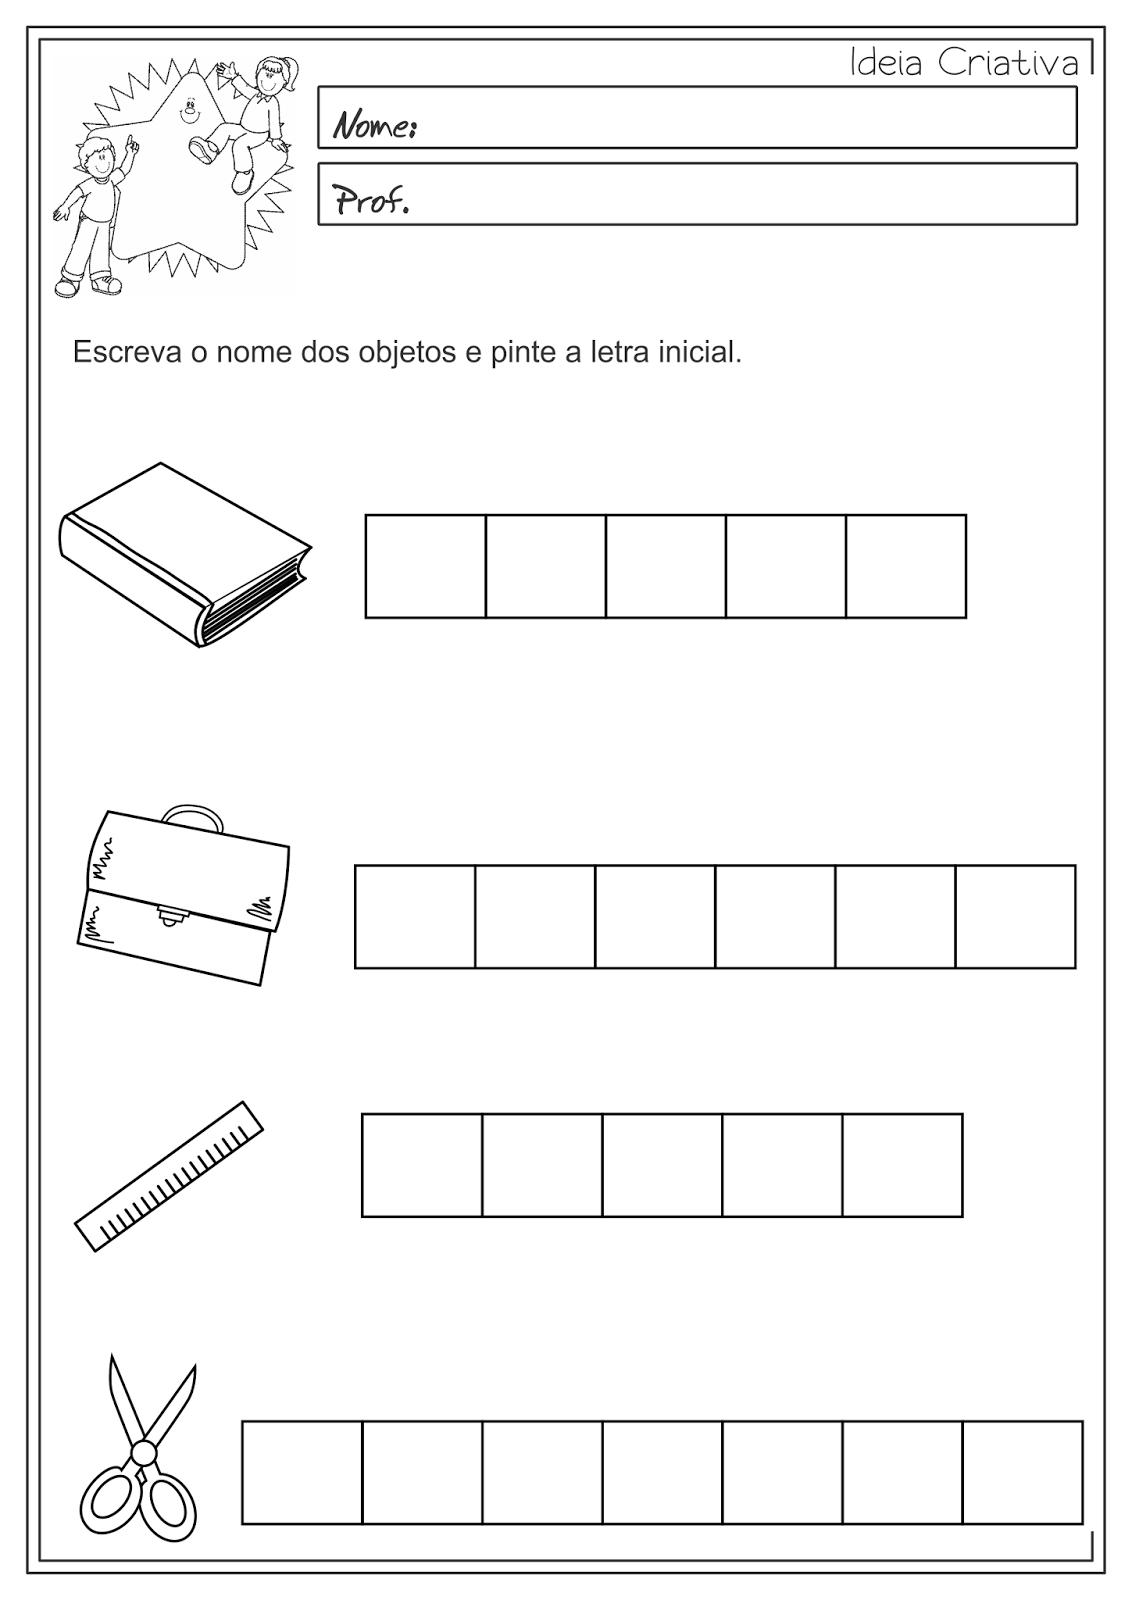 Atividades Educativas Letra Inicial - Ordem Alfabética Língua Portuguesa para Ensino Fundamental